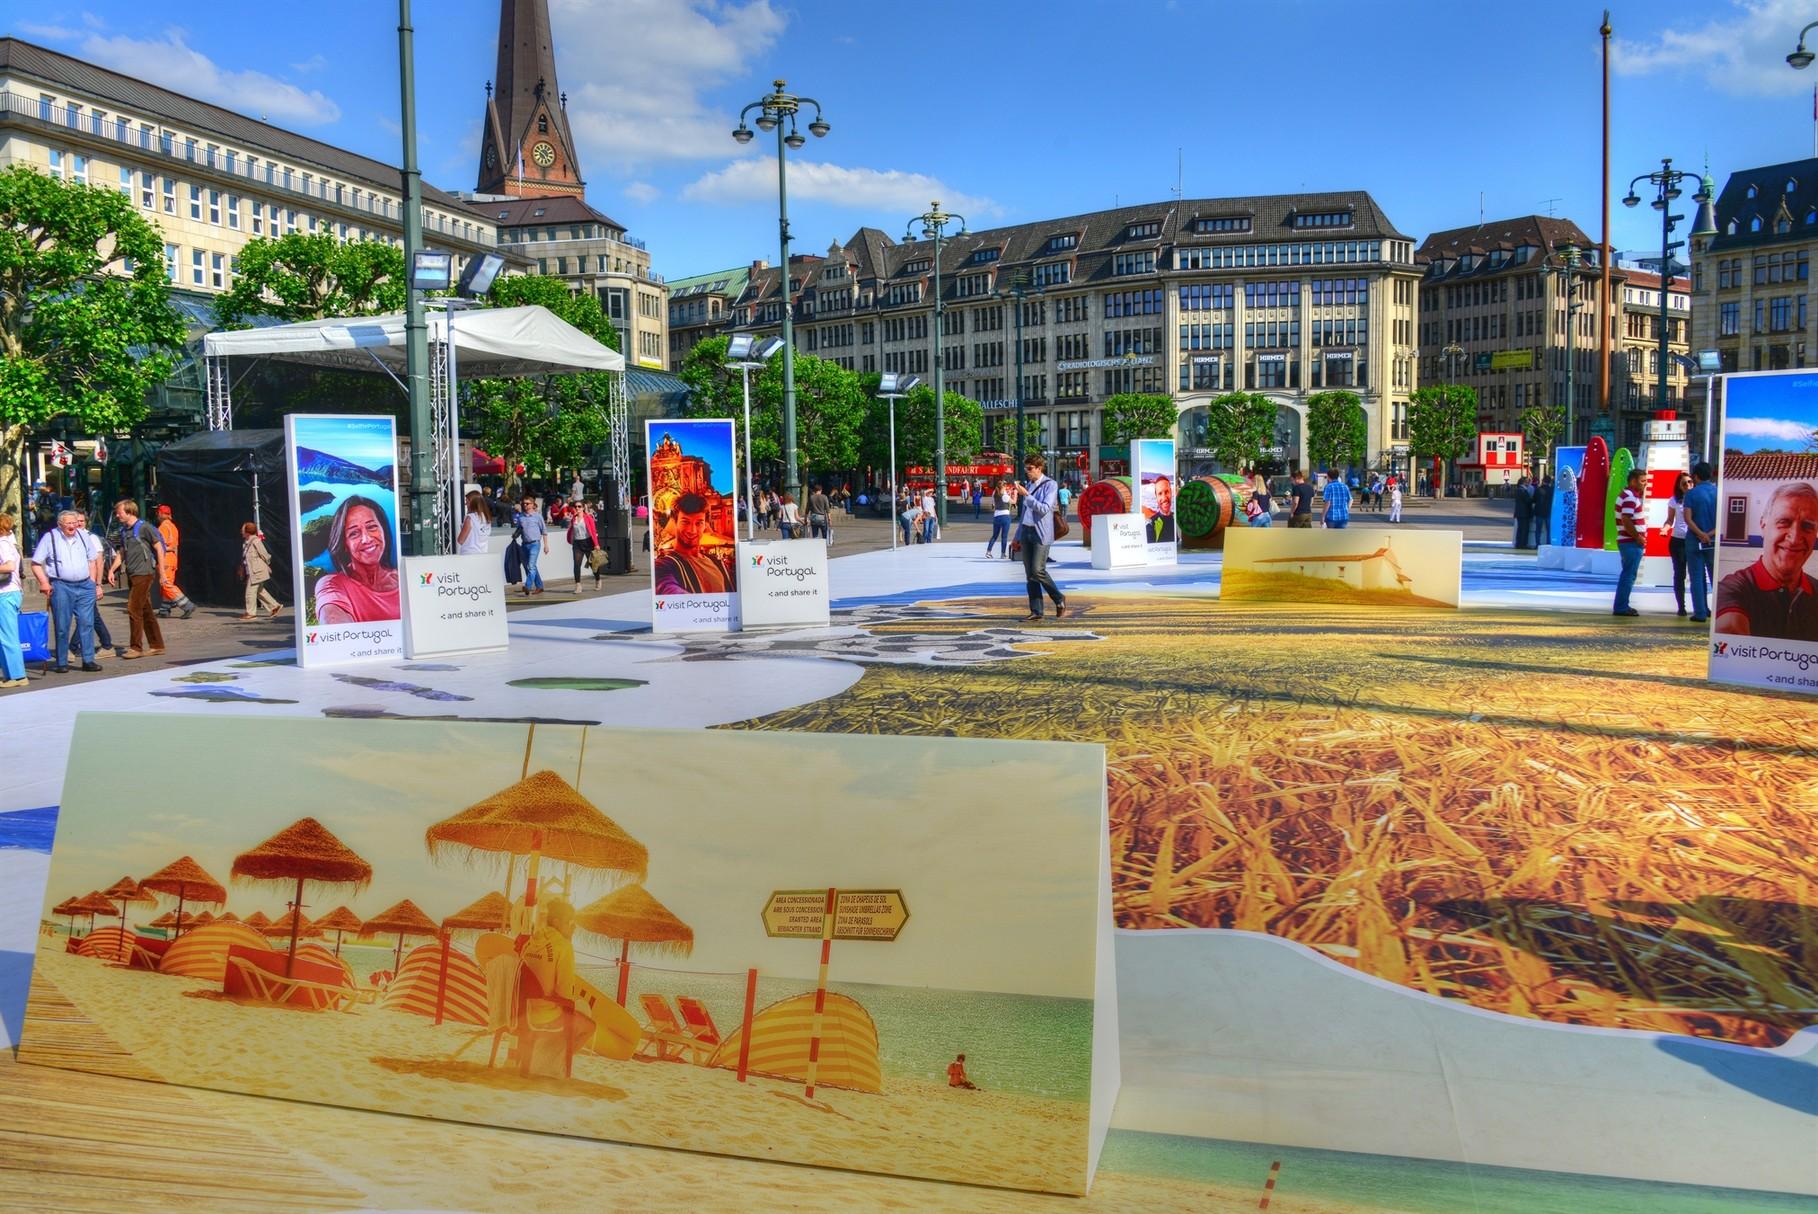 VisitPortugal in Rathausmarkt Hamburg (Foto: Glyn Lowe)